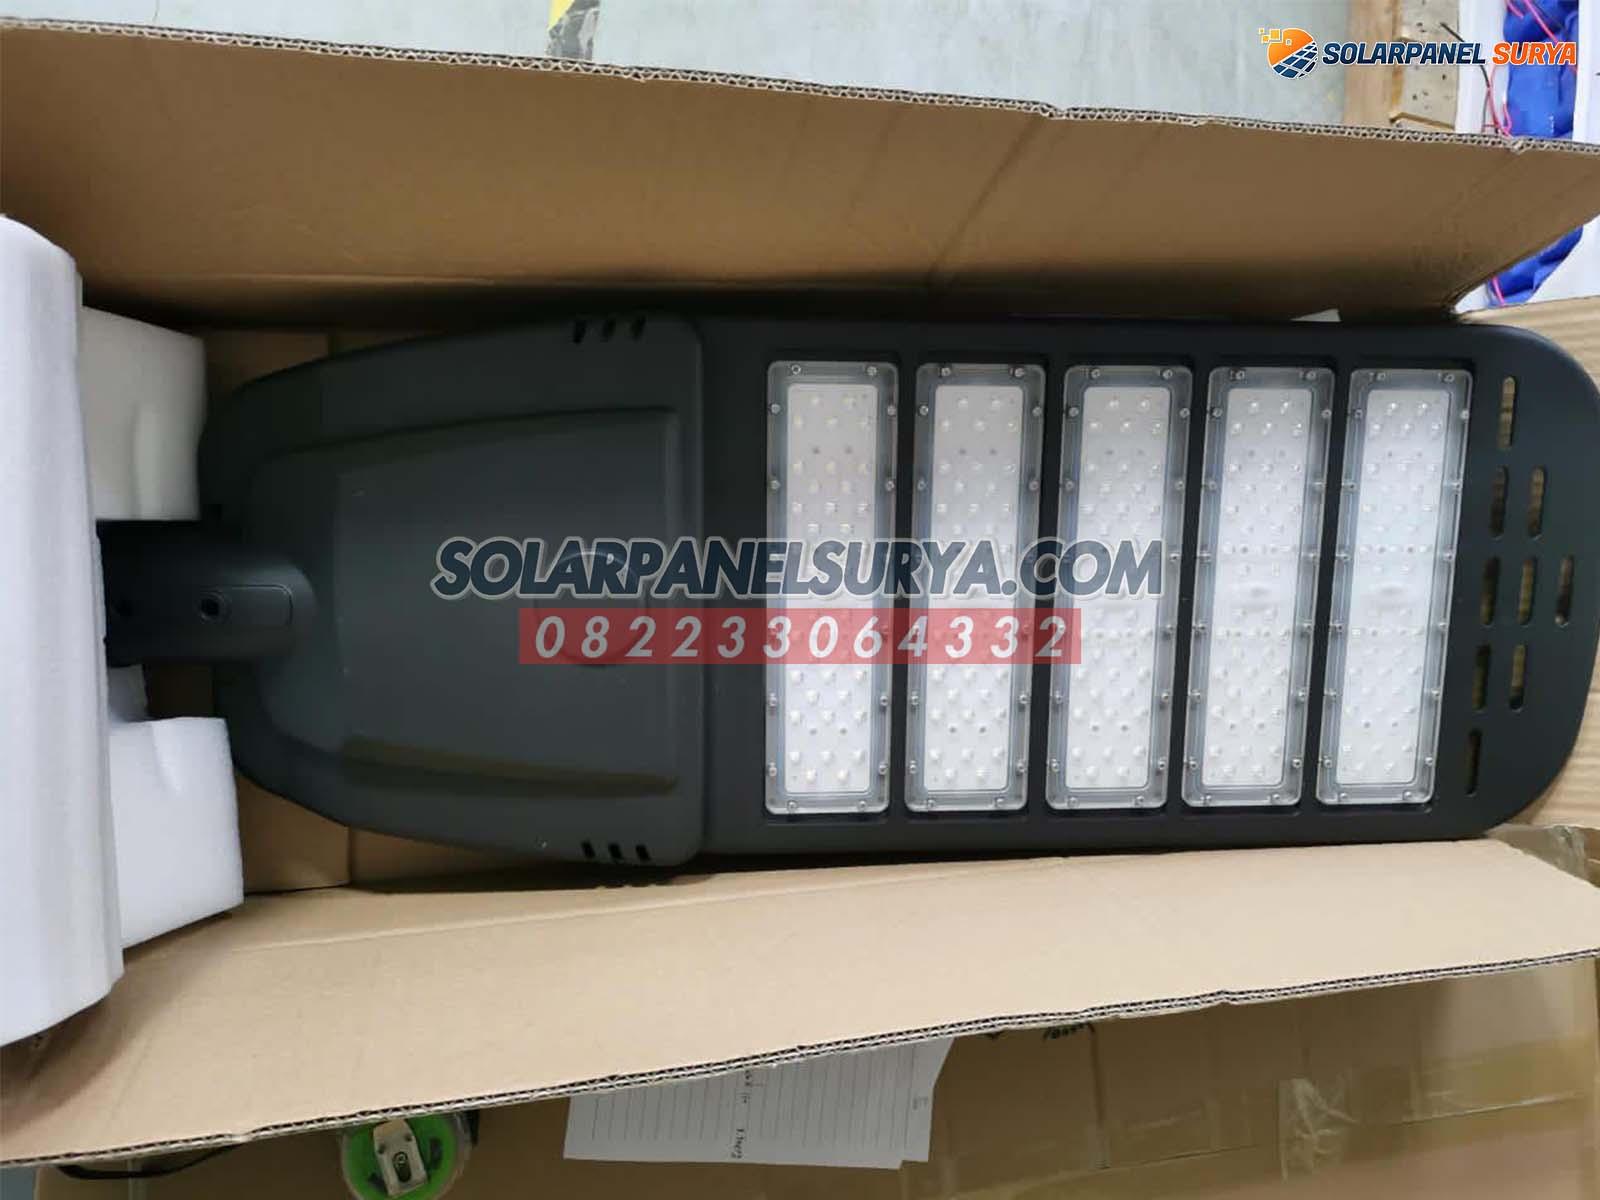 distributor Lampu PJU Tenaga Surya 2in1 80 Watt Night Sky